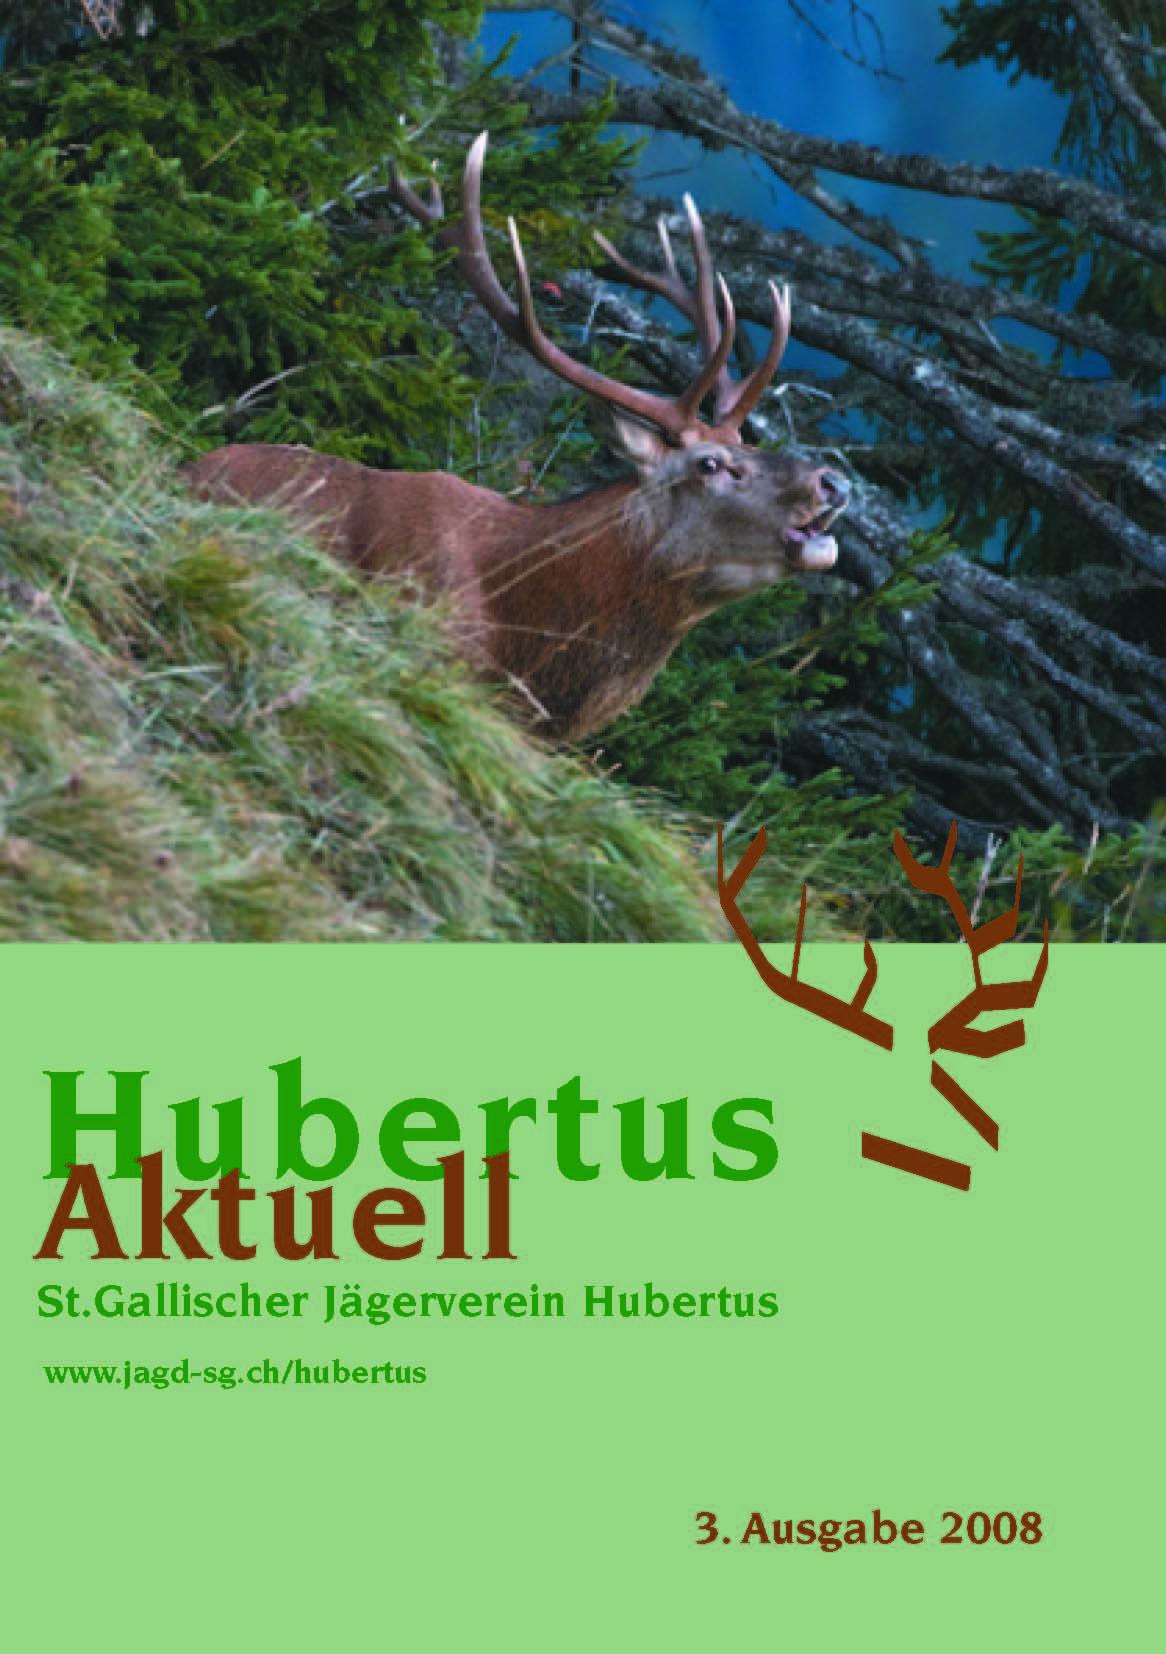 hubertus akutell 03 2008